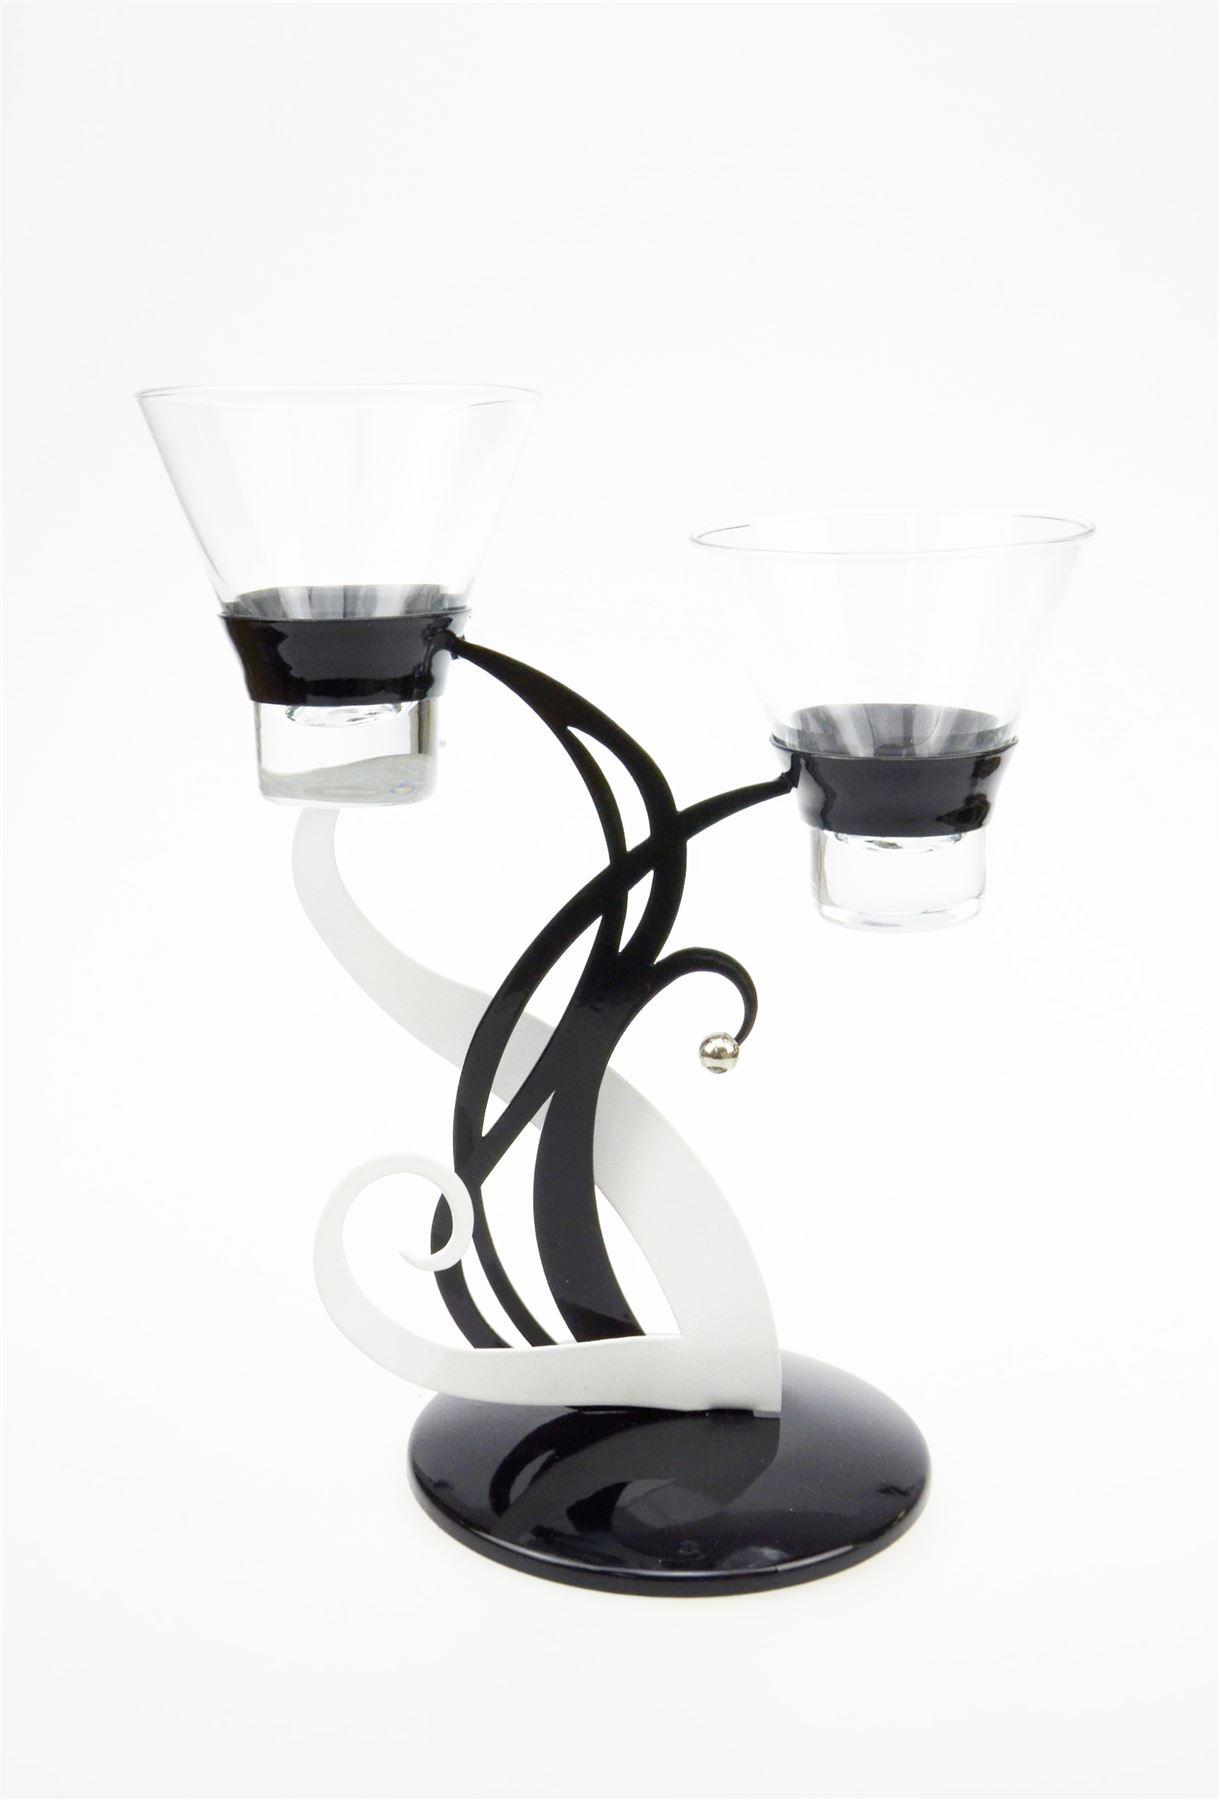 Candle tea light holder candlestick black white silver